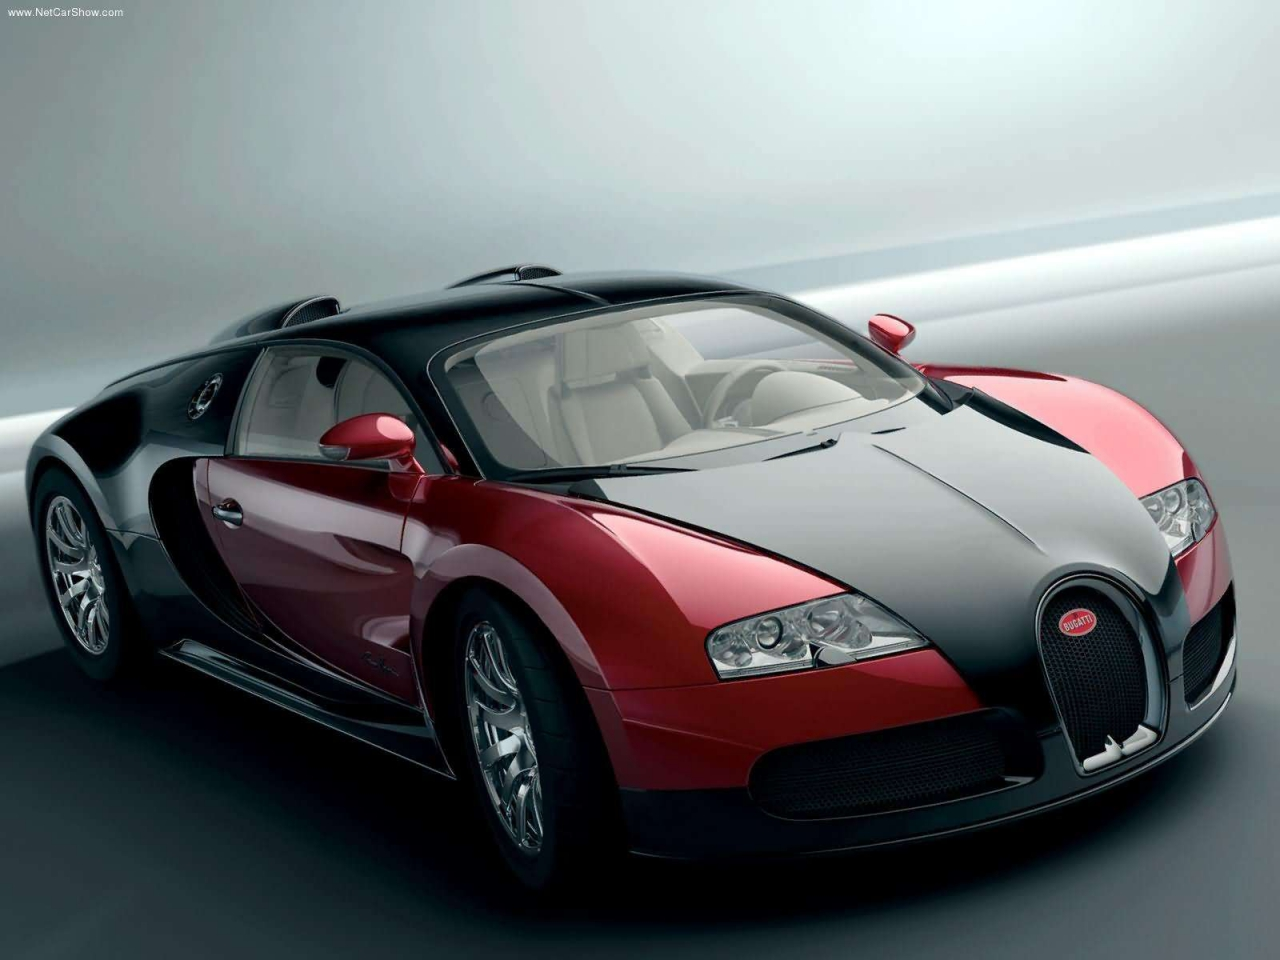 Stunning Bugatti Wallpaper